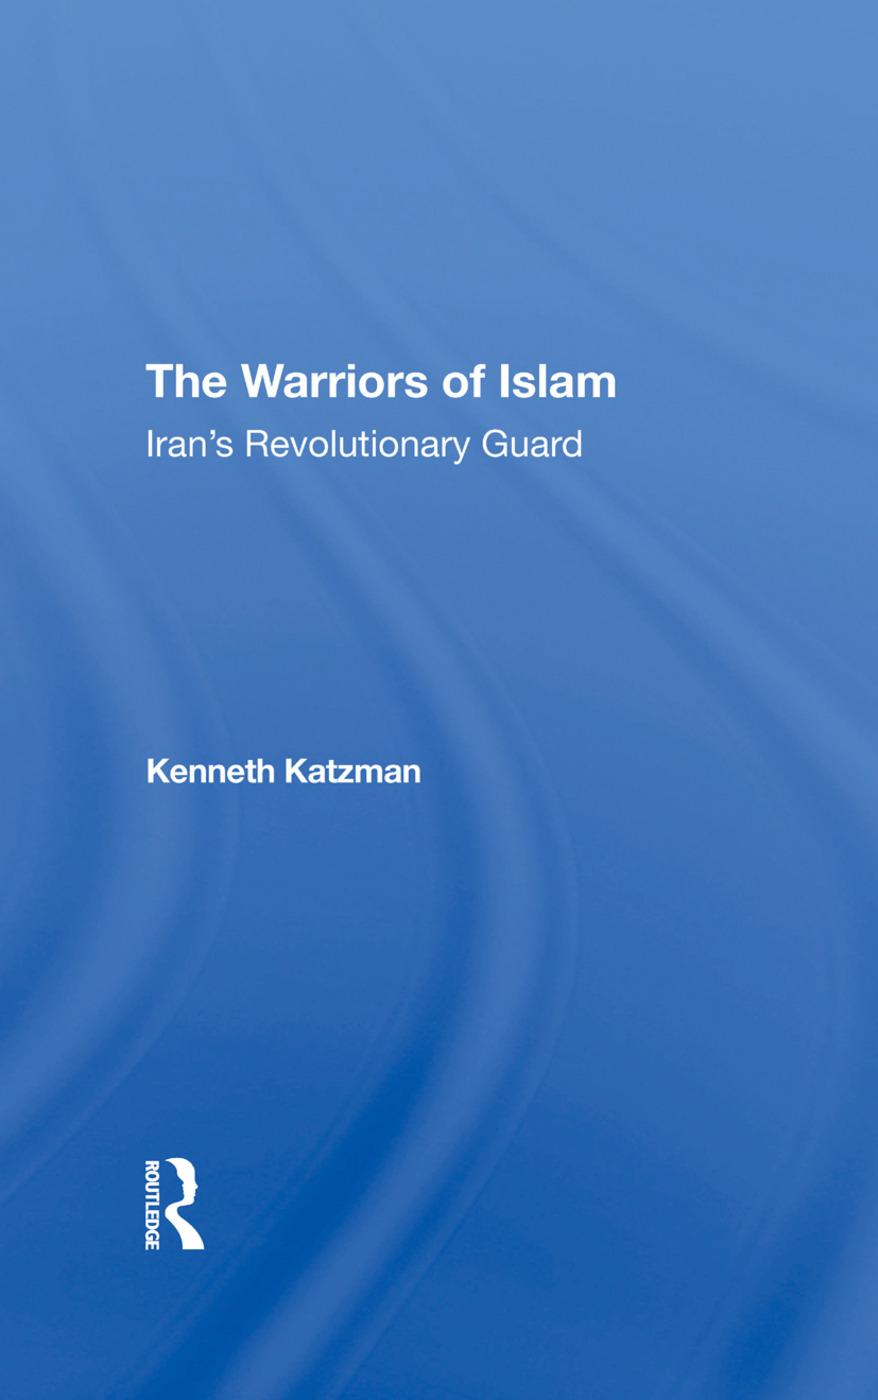 The Warriors Of Islam: Iran's Revolutionary Guard, 1st Edition (Hardback) book cover